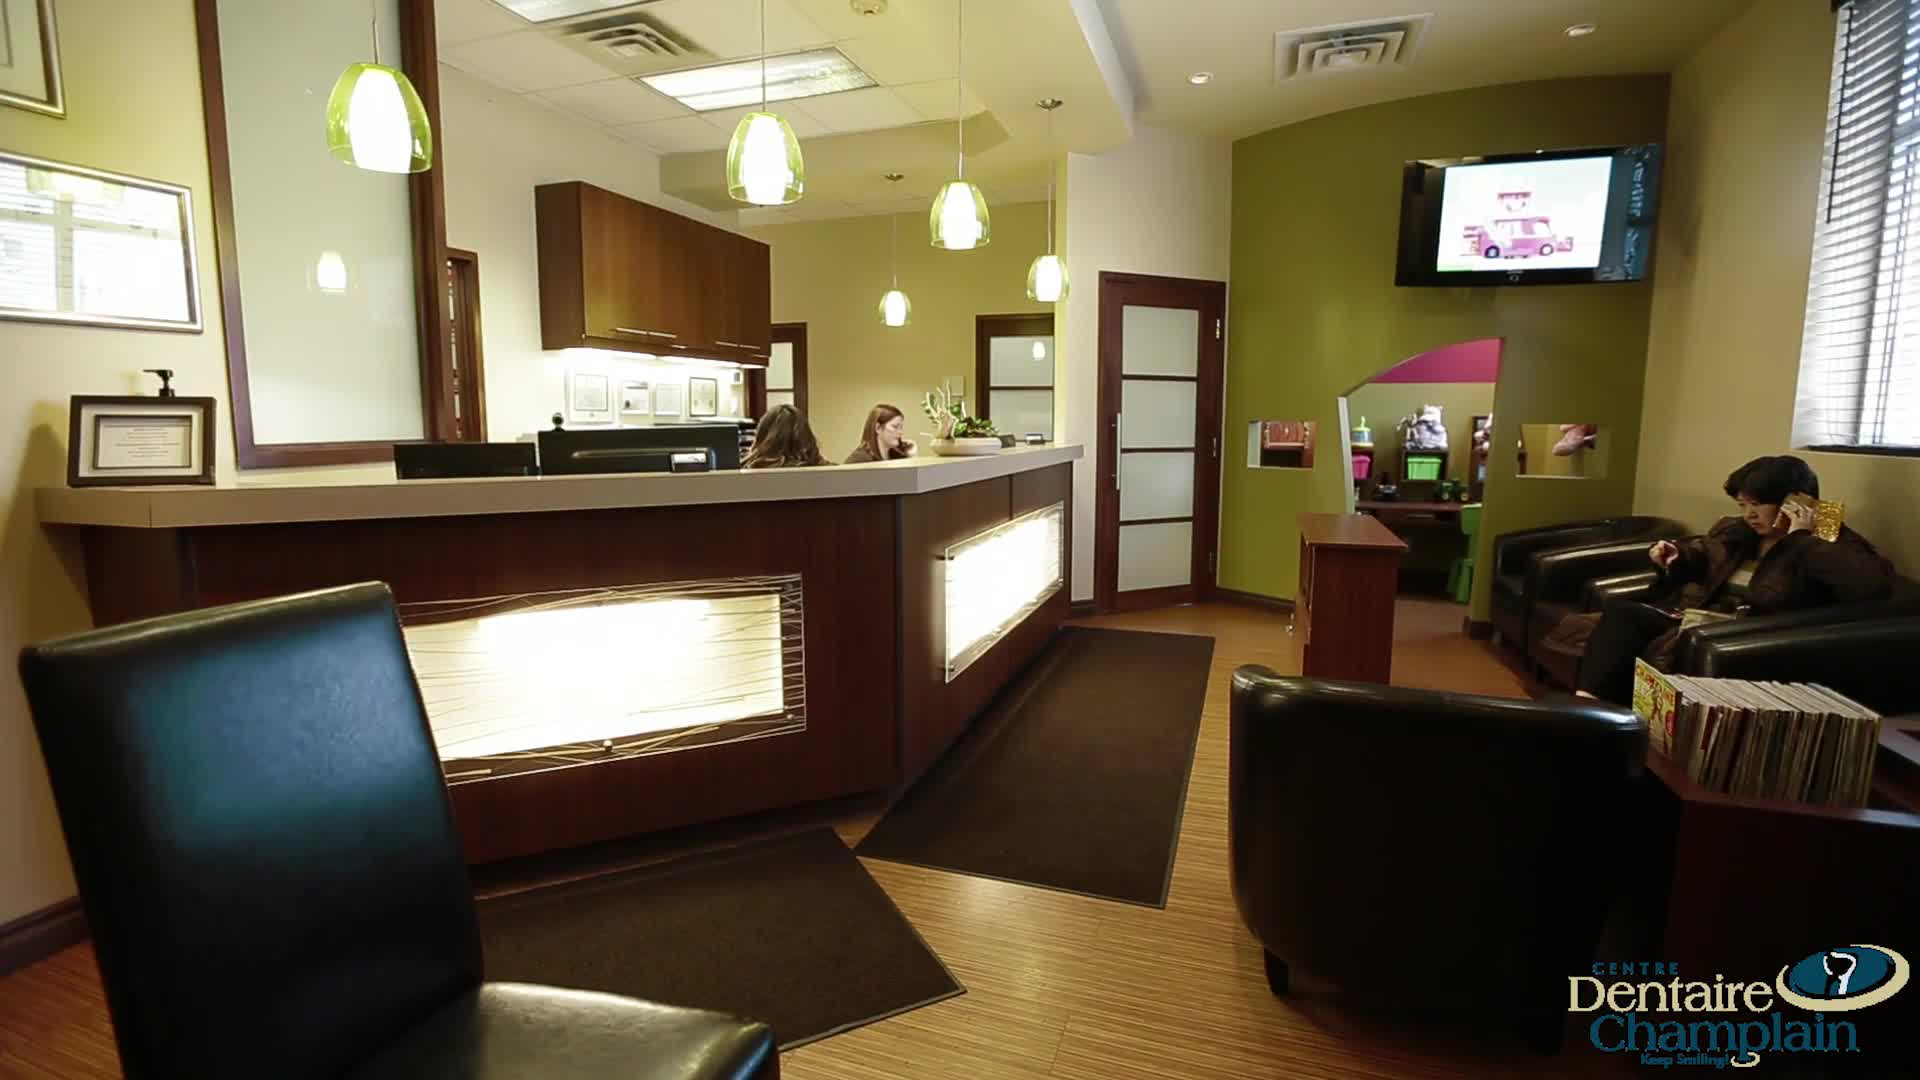 Centre Dentaire Champlain - Dentists - 8196821682